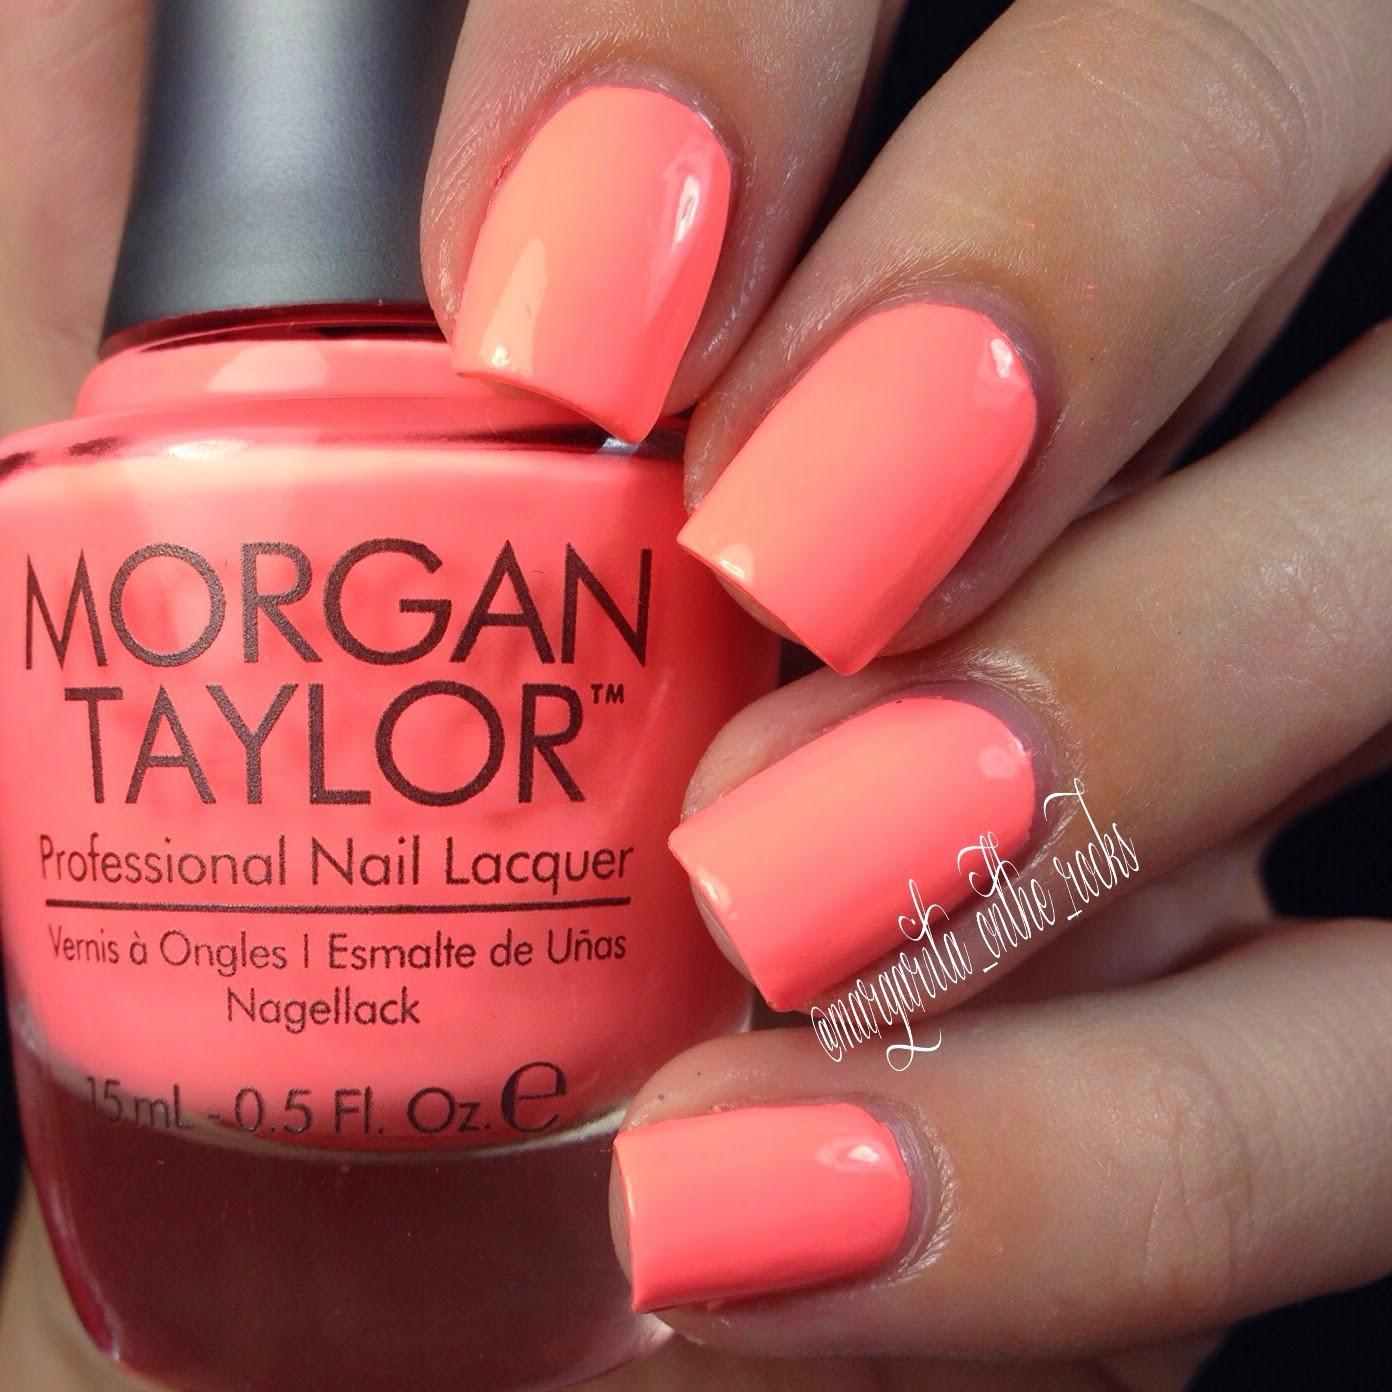 Morgan Taylor 2014 Summer Neon Collection - Polish Etc.